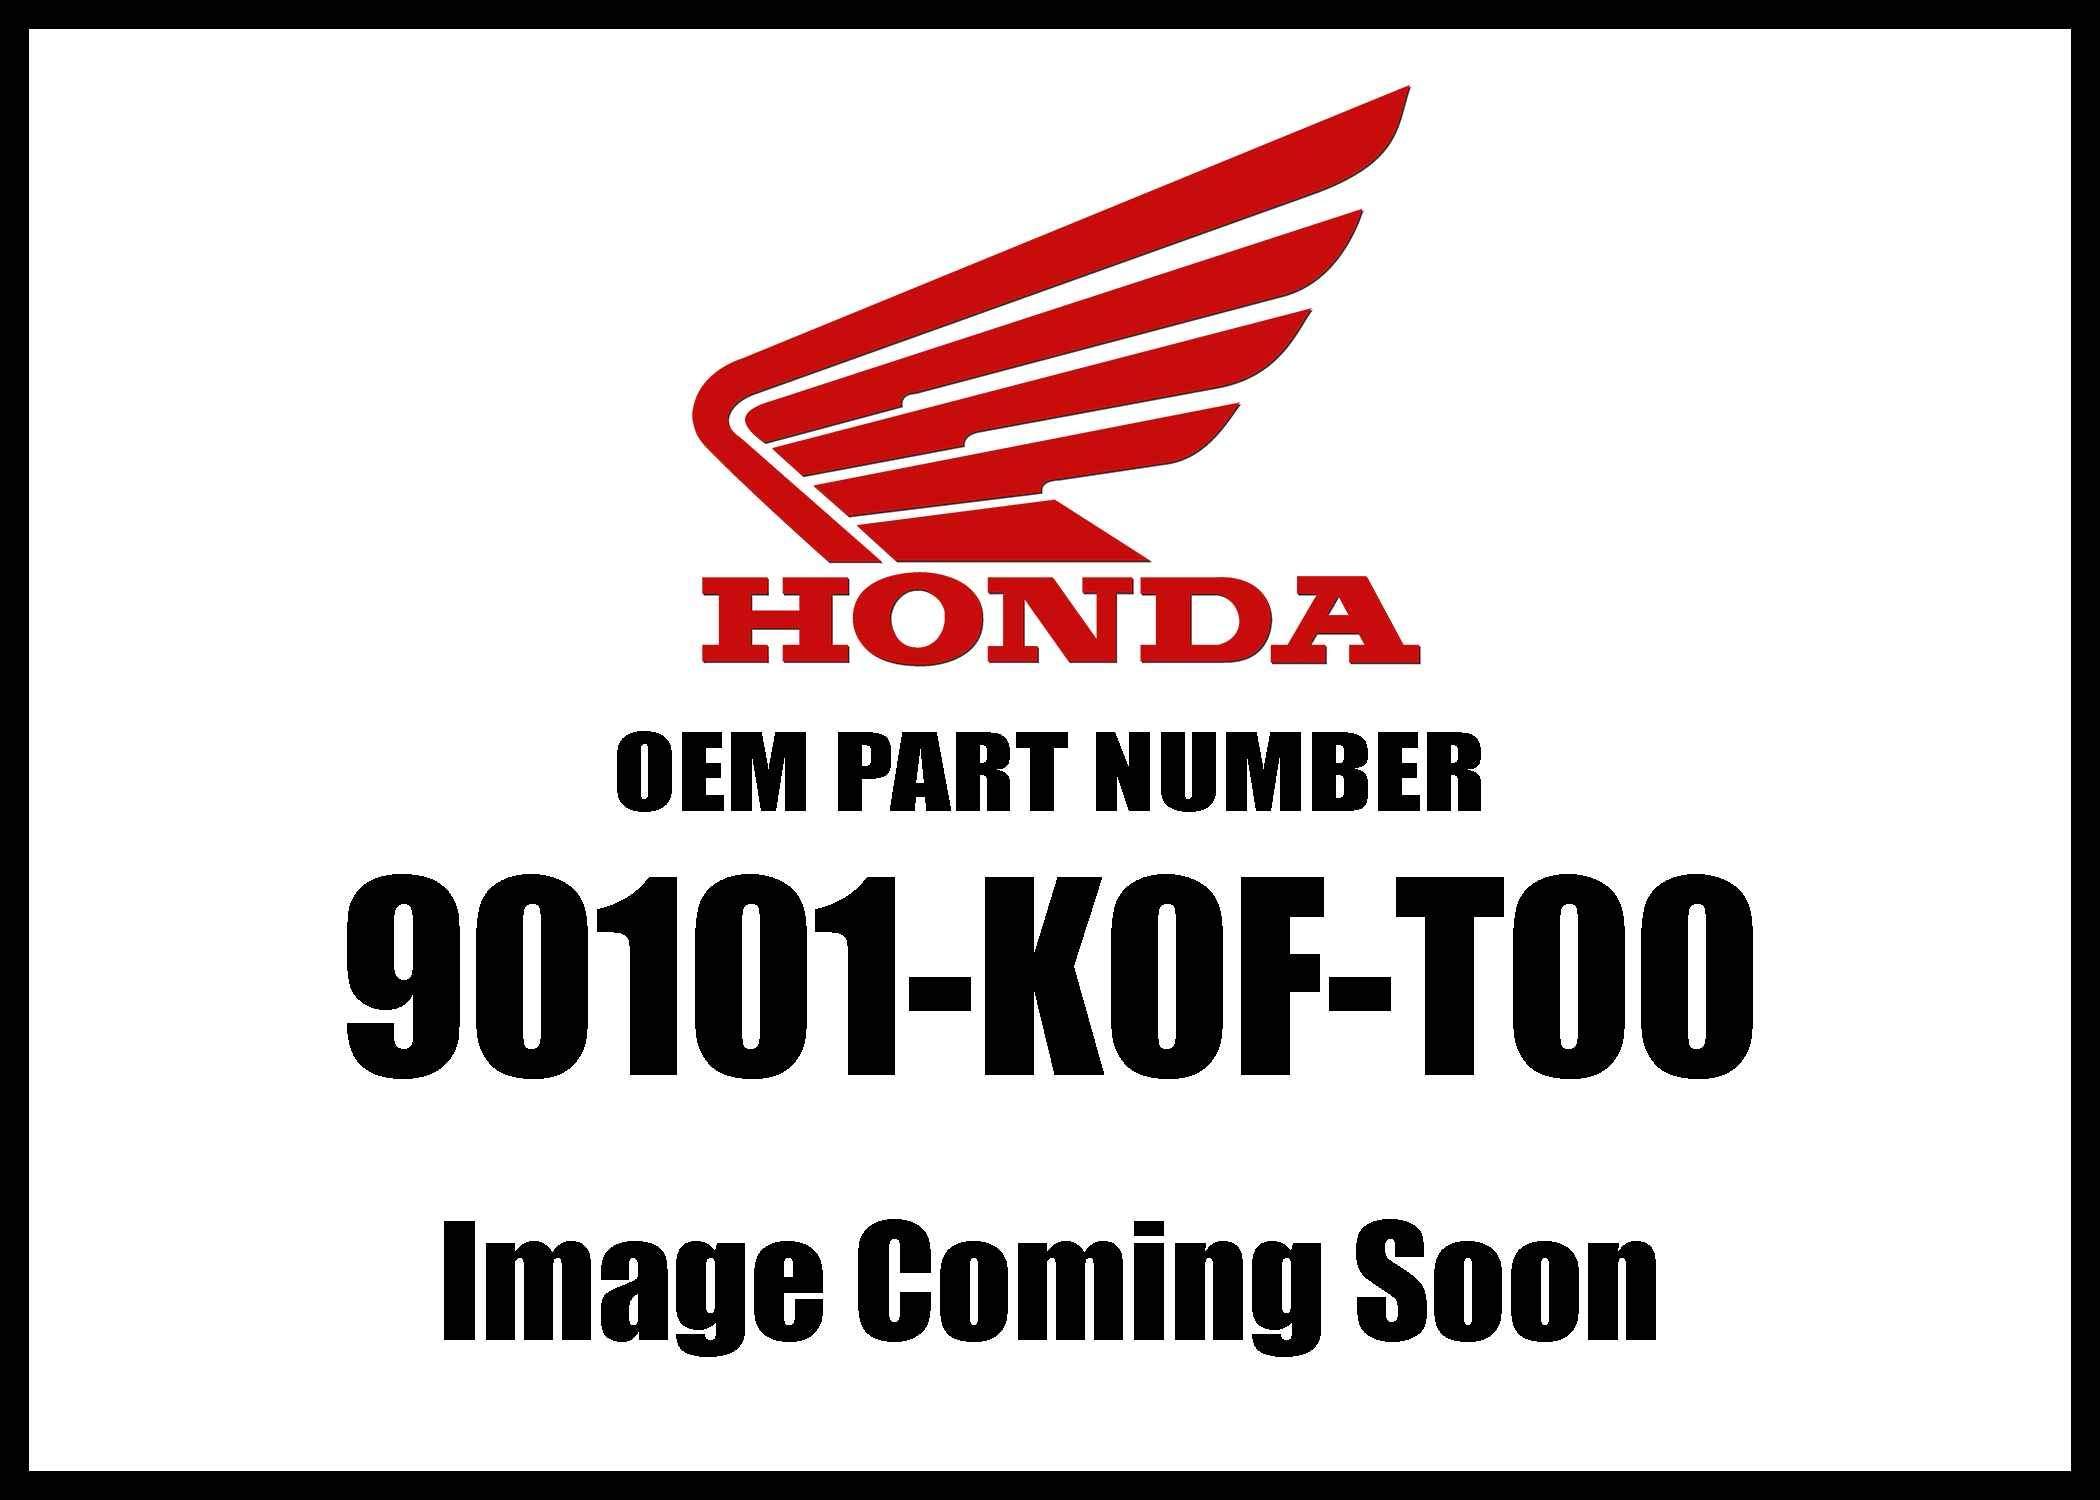 Honda Z125m '19 Bolt Flange Socket 90101-K0f-T00 New Oem